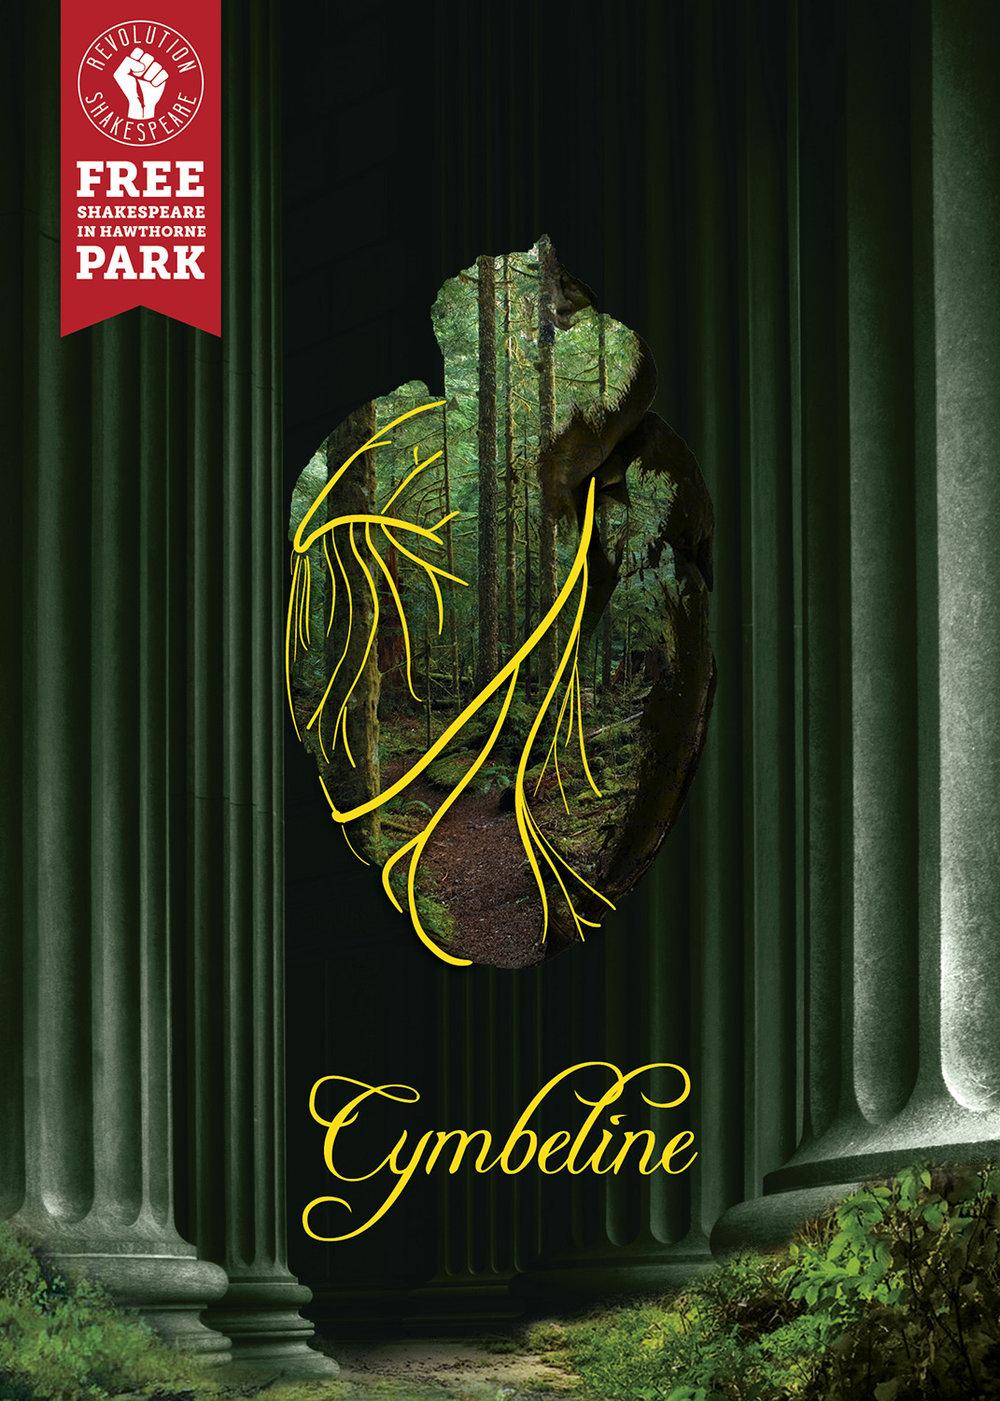 Cymbeline_5x7Postcard.jpg